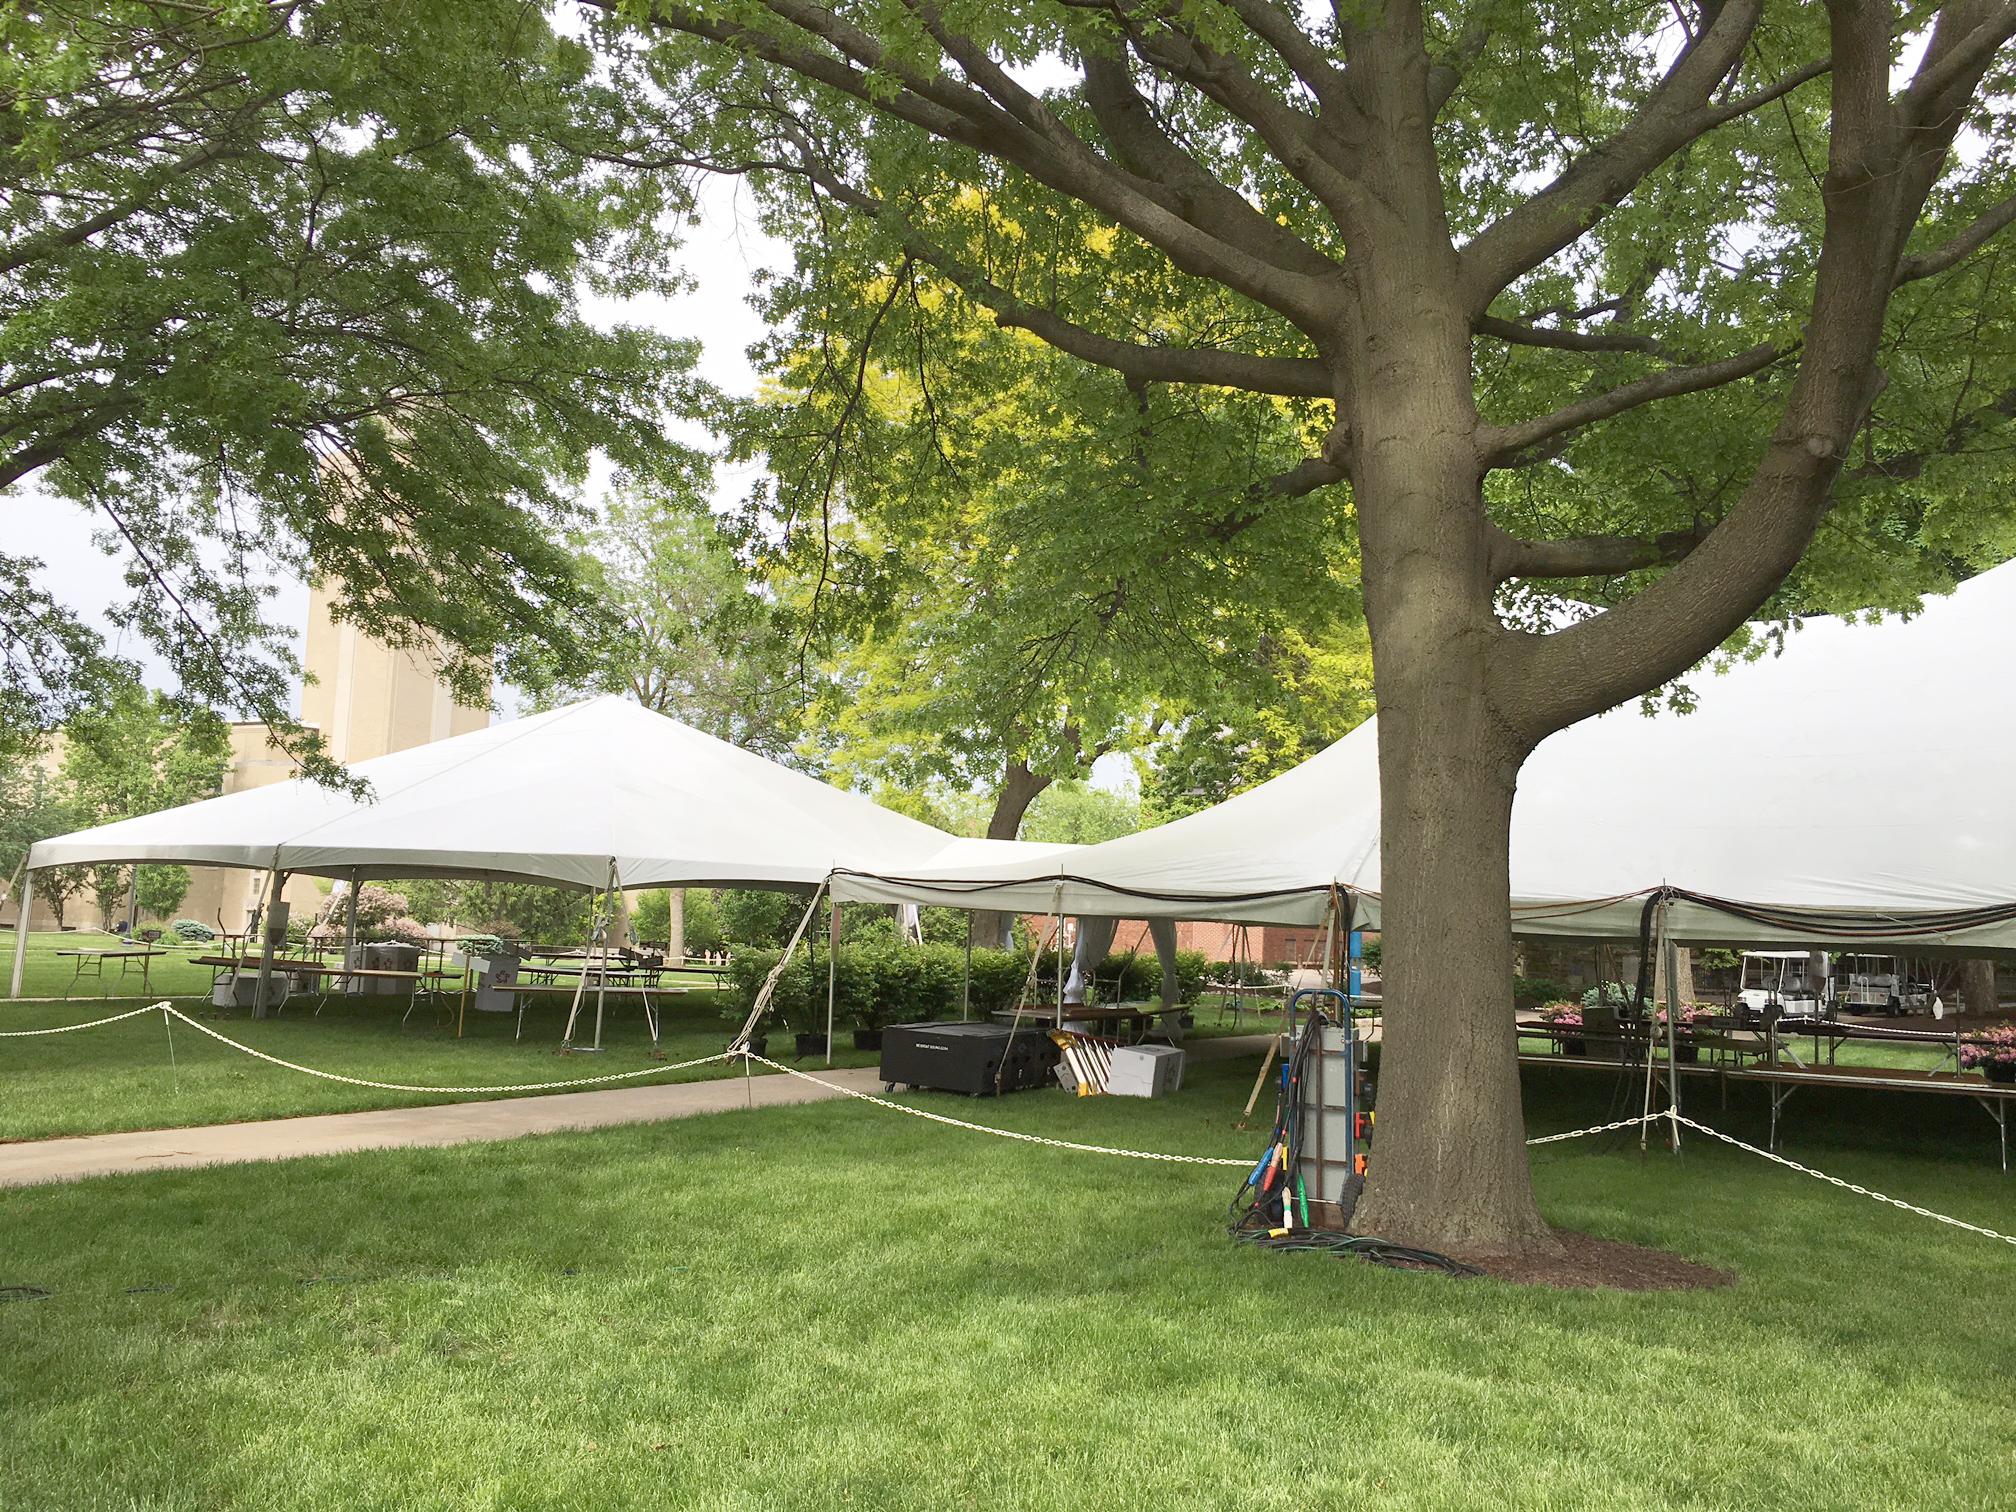 40u0027 x 40u0027 Hybrid tent and 40u0027 x 140u0027 Rope and Pole & Tents for Wine Festival/Wine Tasting event in Davenport IA